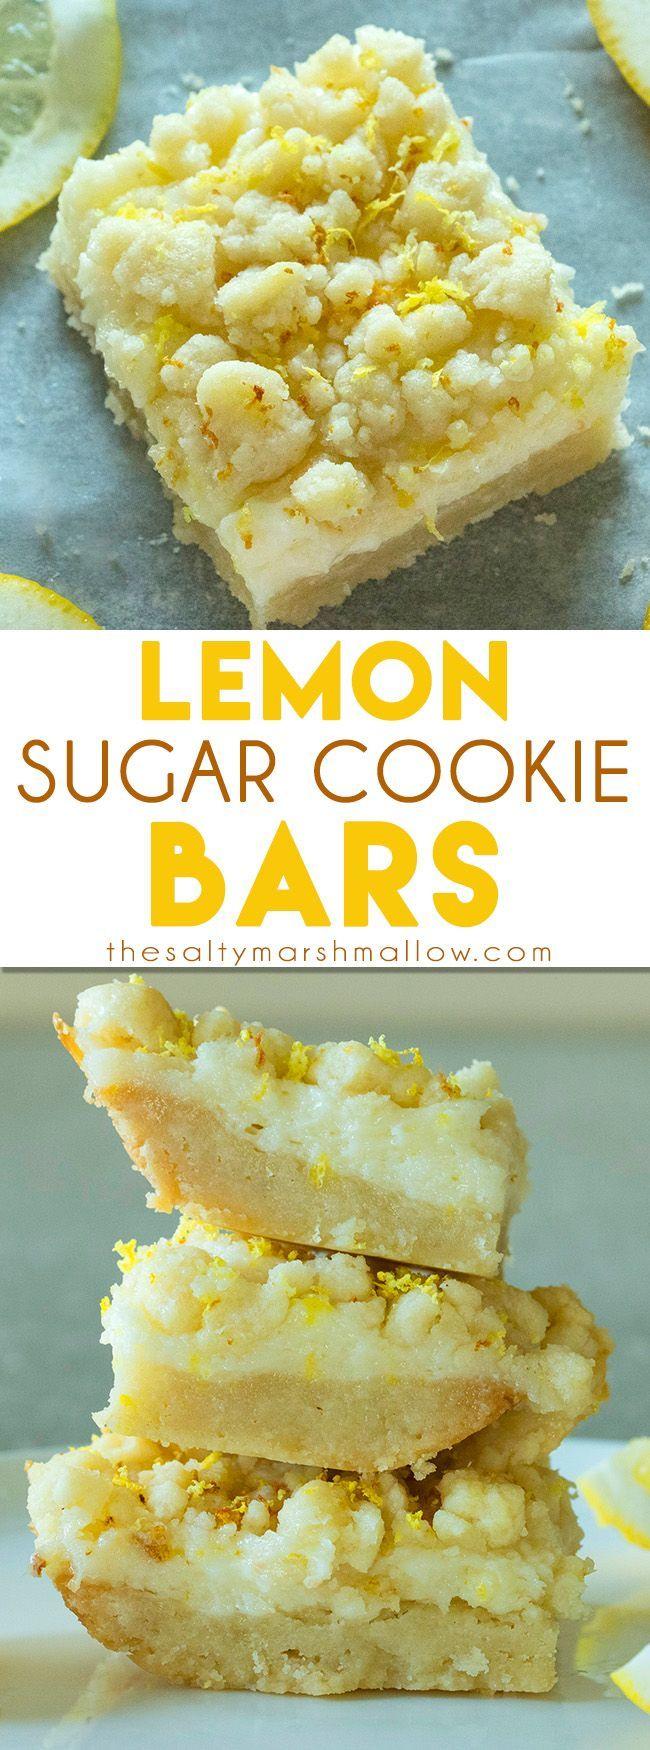 Lemon Sugar Cookie Bars #sugarcookierecipe